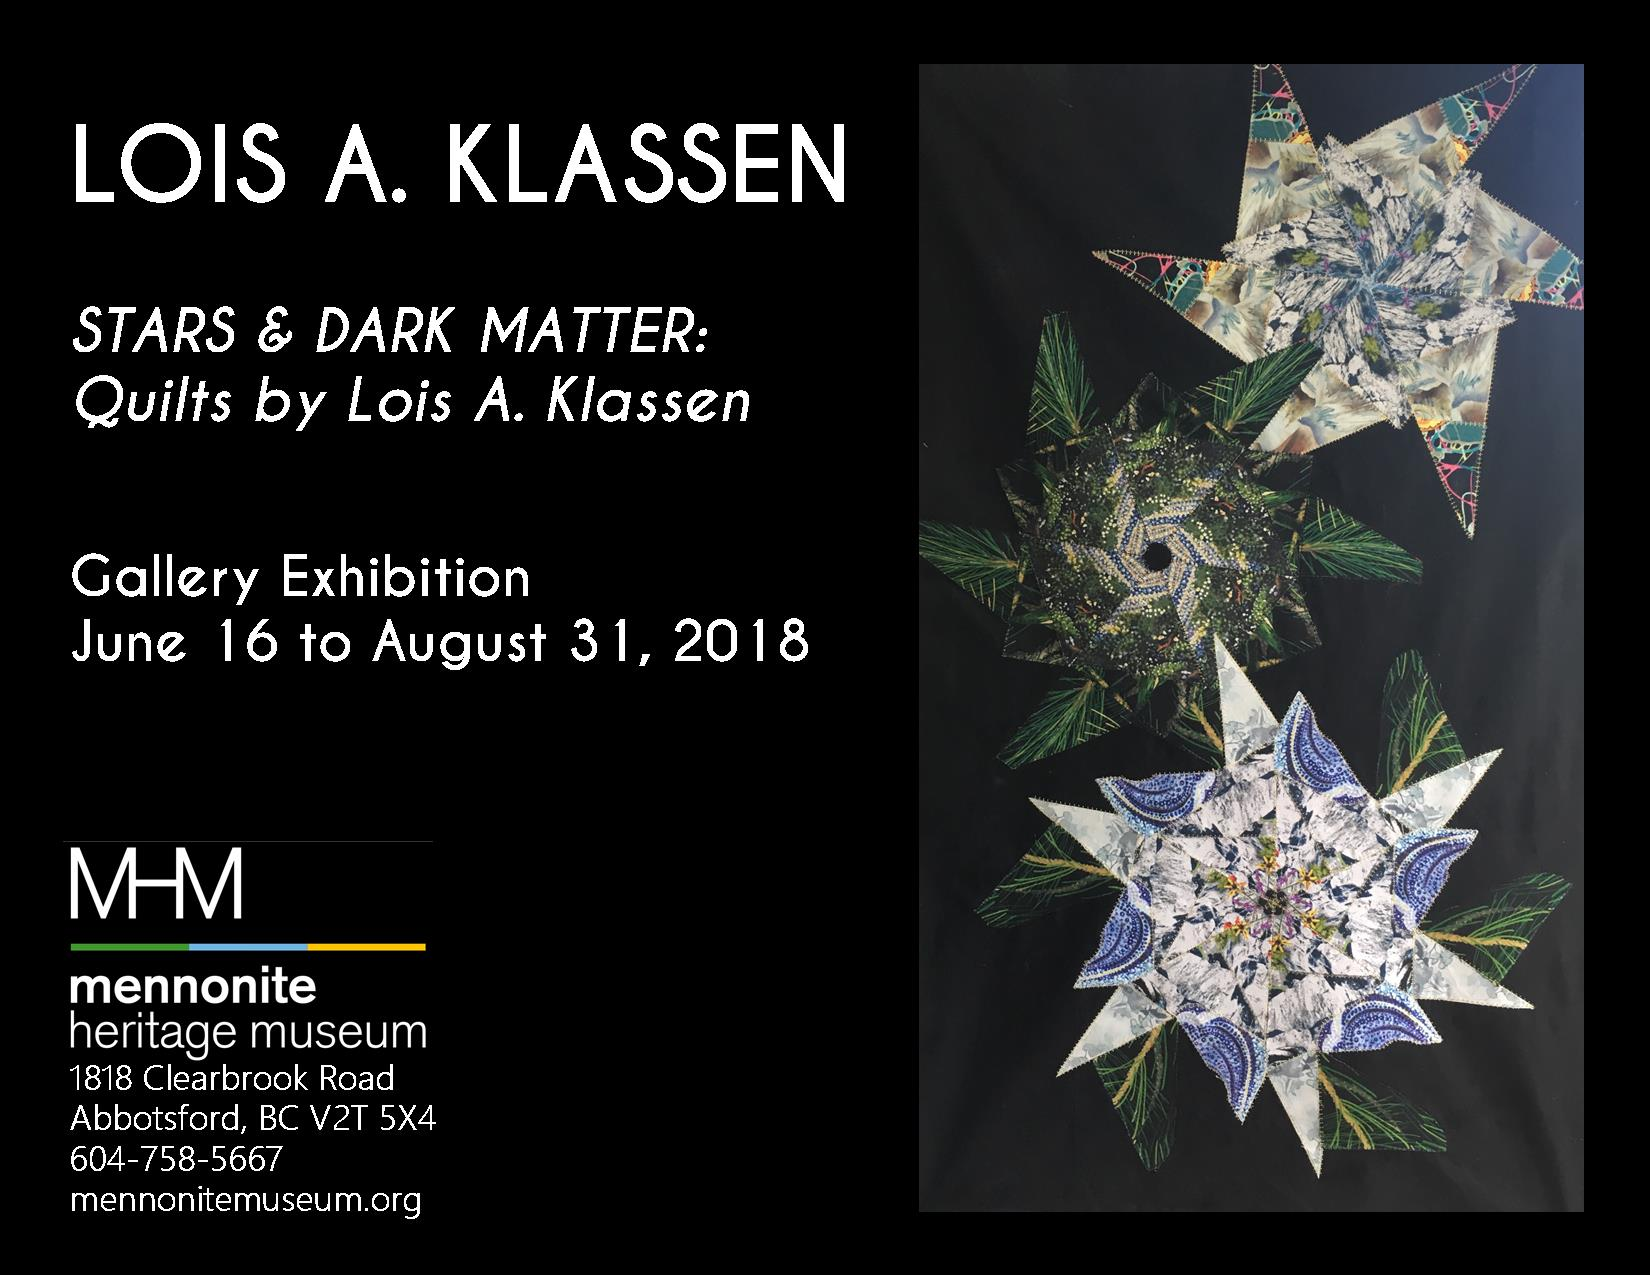 Lois Klassen Gallery Exhibition Poster